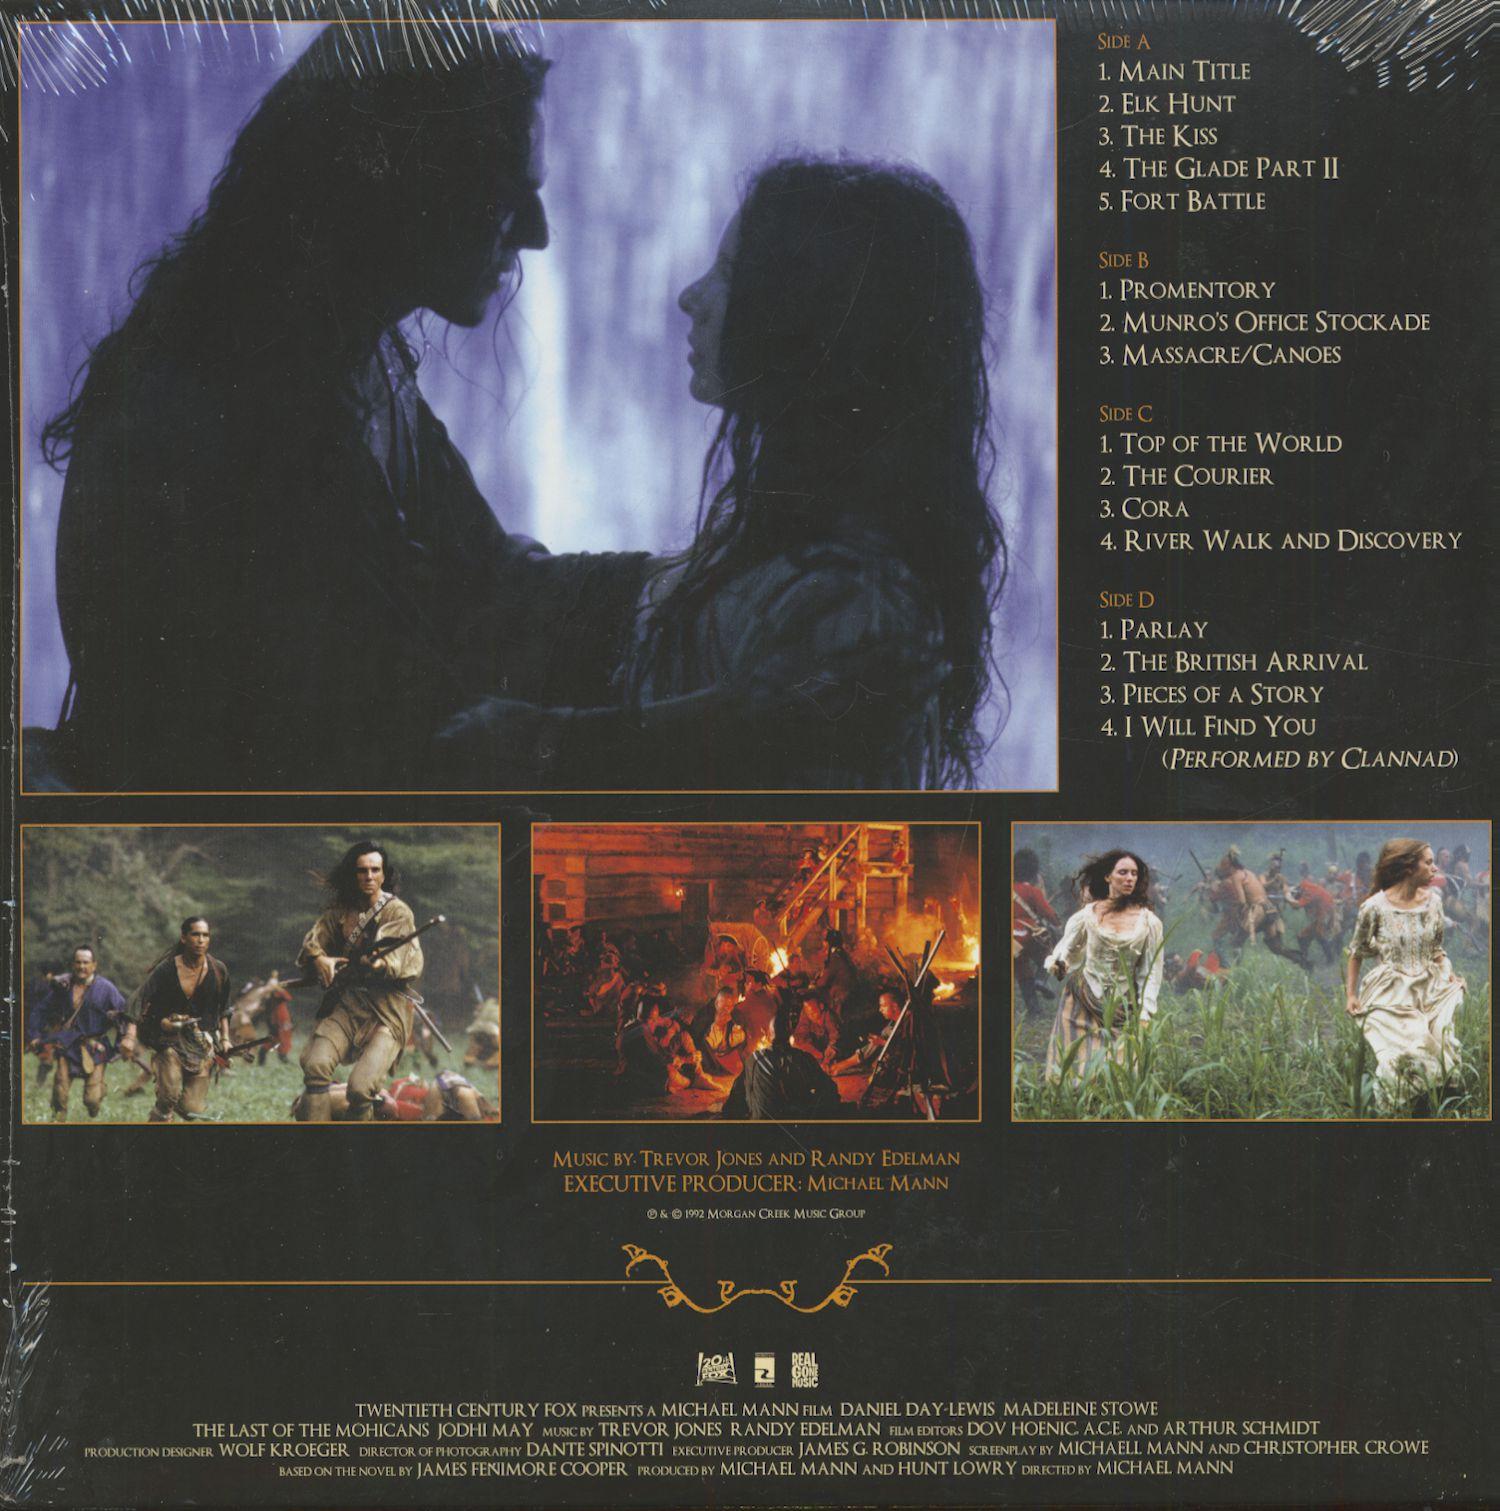 Trevor Jones Amp Randy Edelman Lp The Last Of The Mohicans